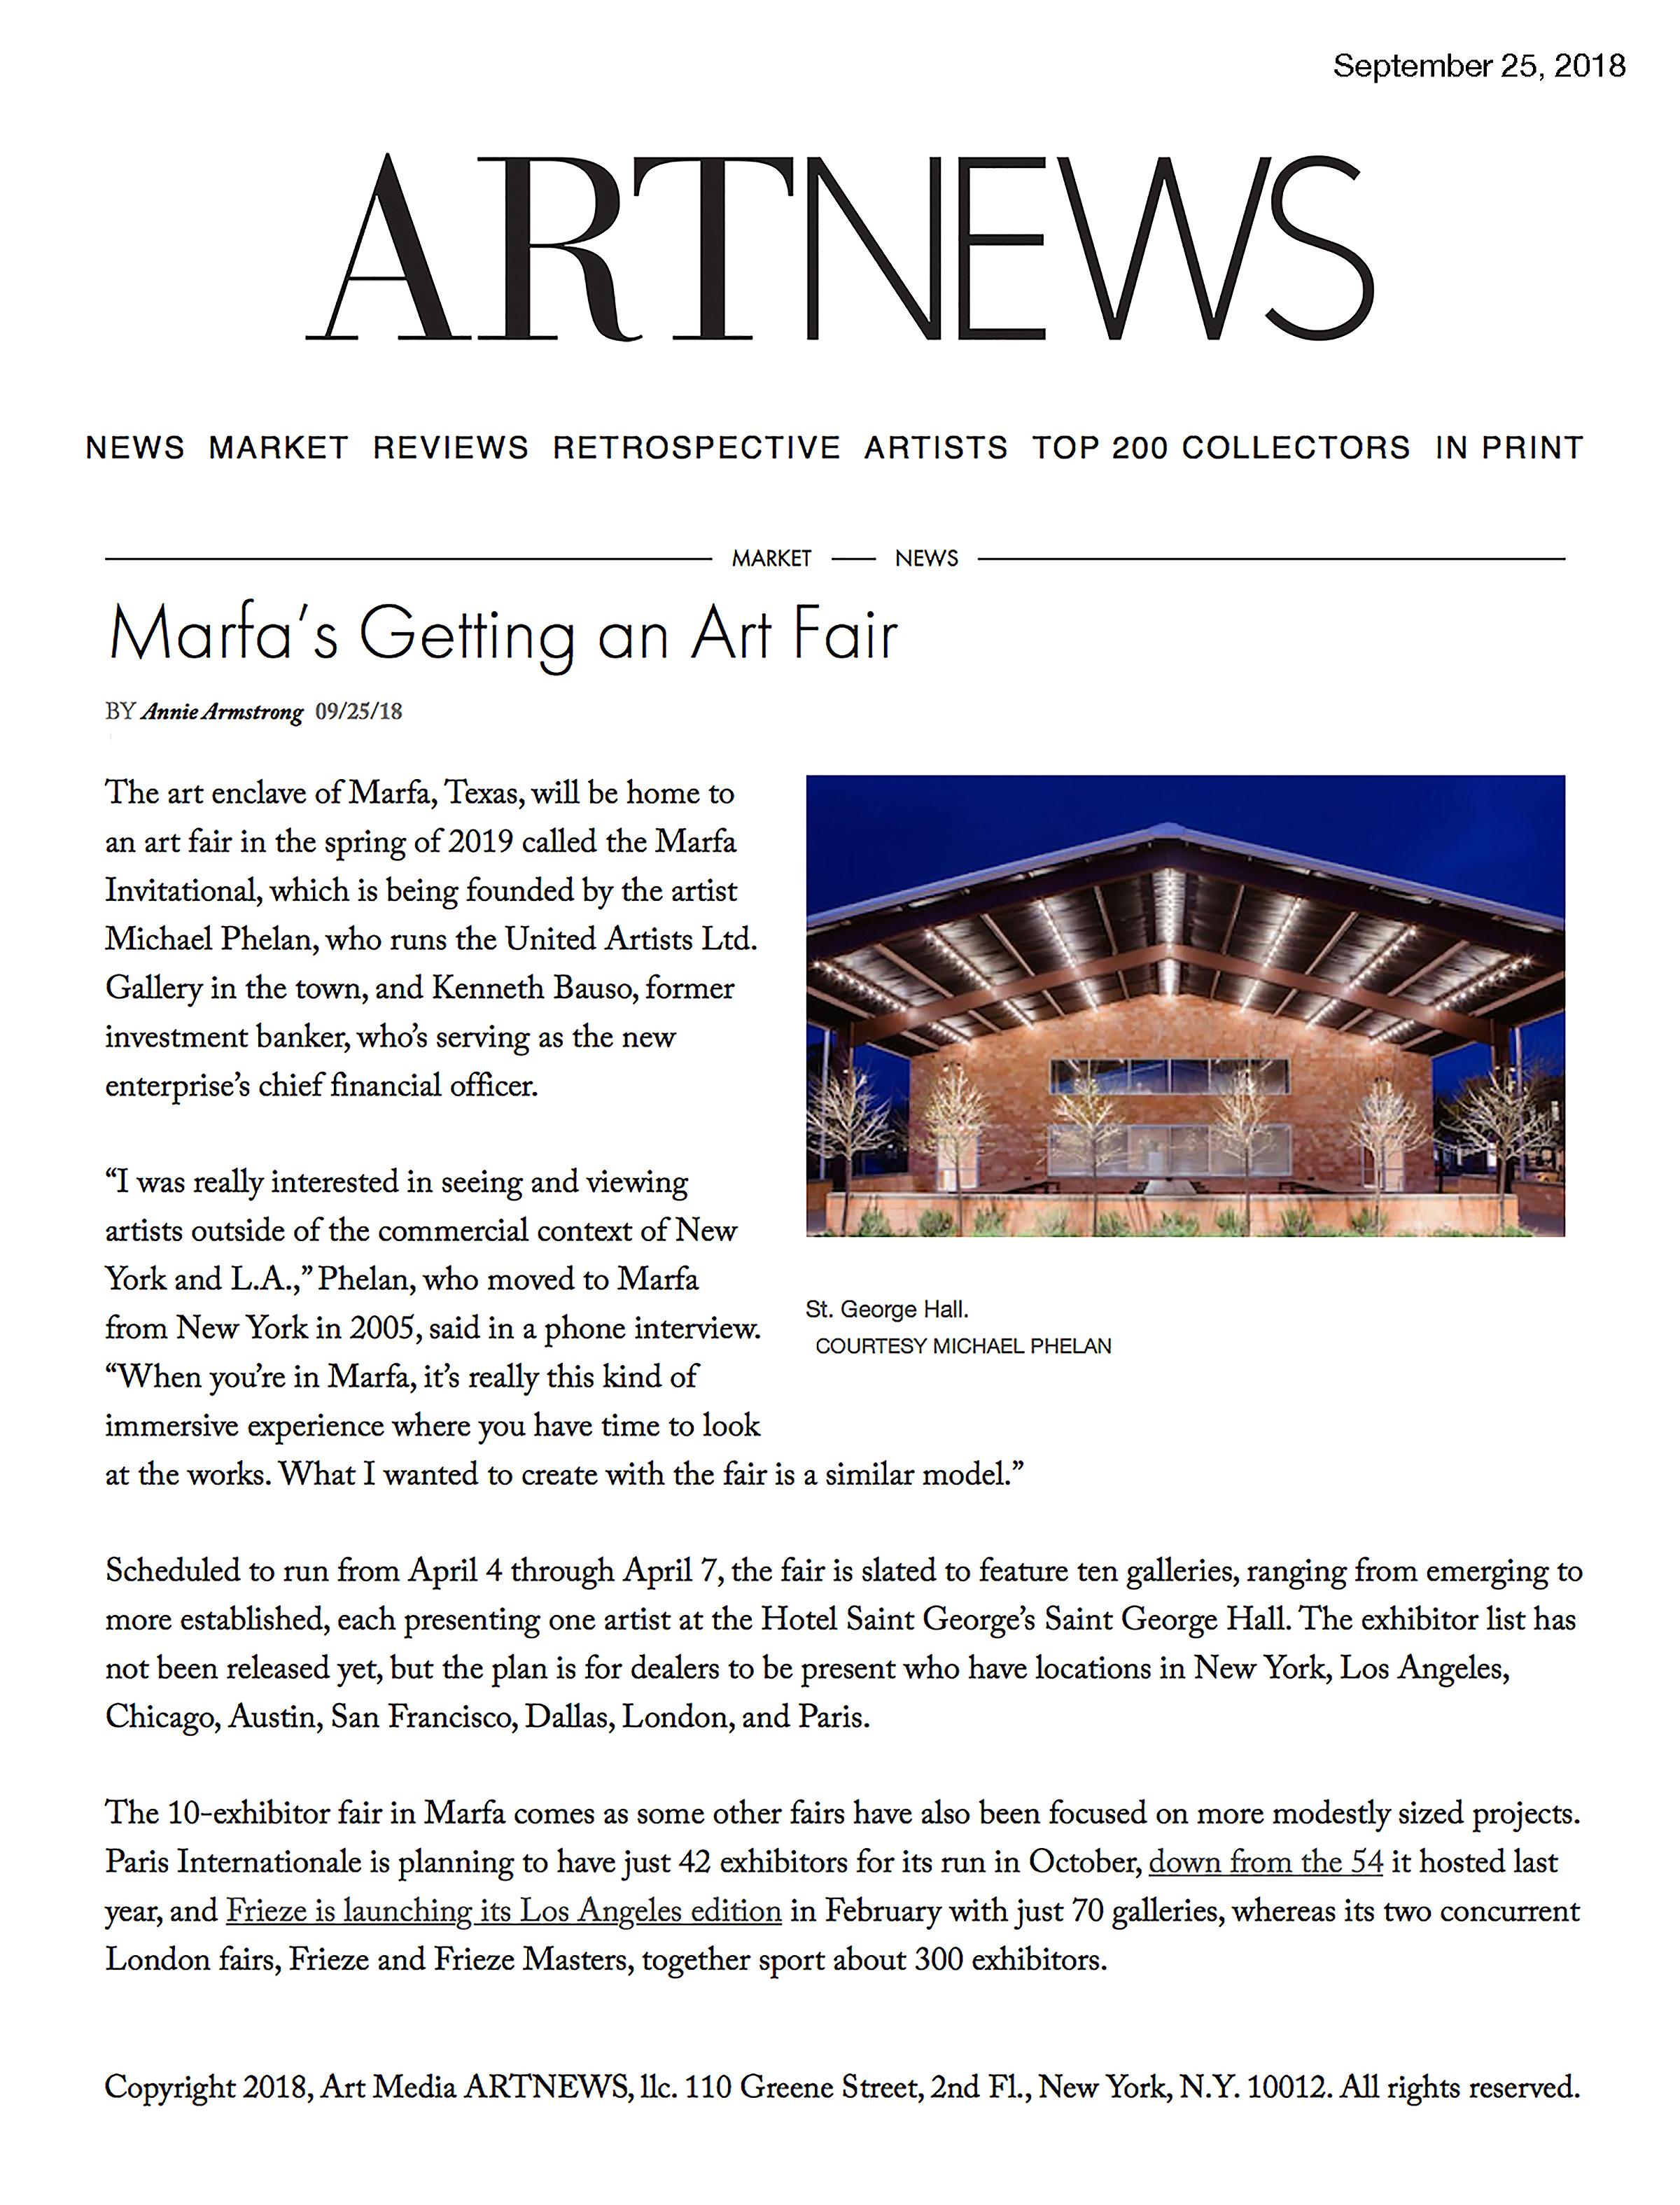 MI-Press-ARTNEWS-Sep 25, 2018-Amy Armstrong-Market-News.jpg